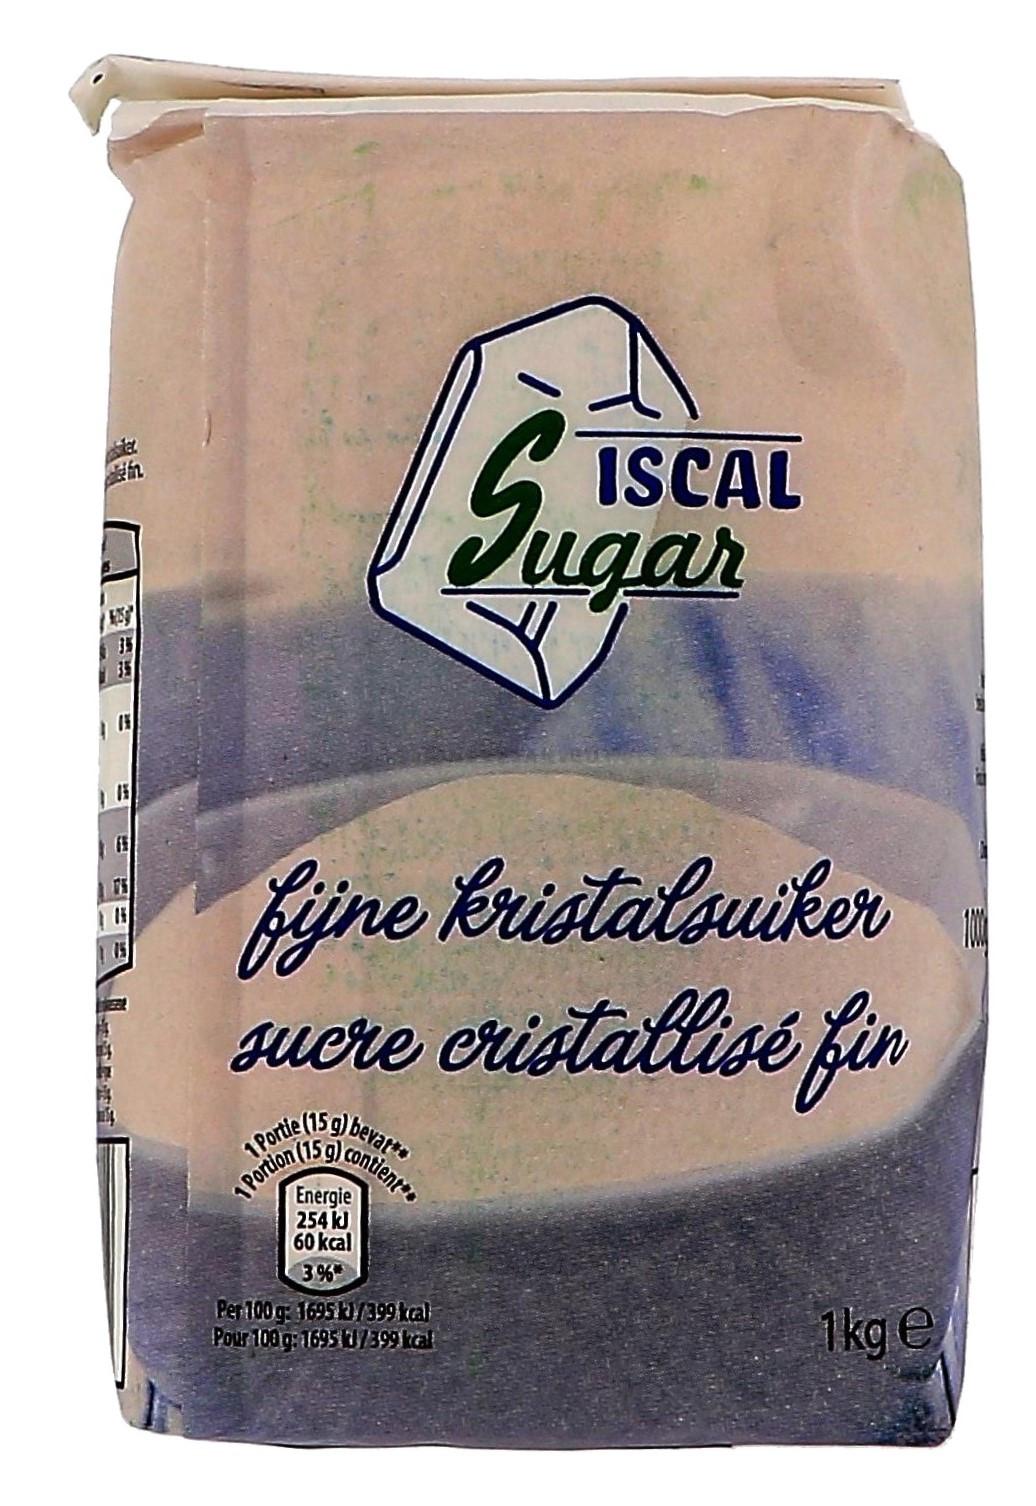 Sucre Cristallise fin 1kg Iscal Sugar (Suiker)